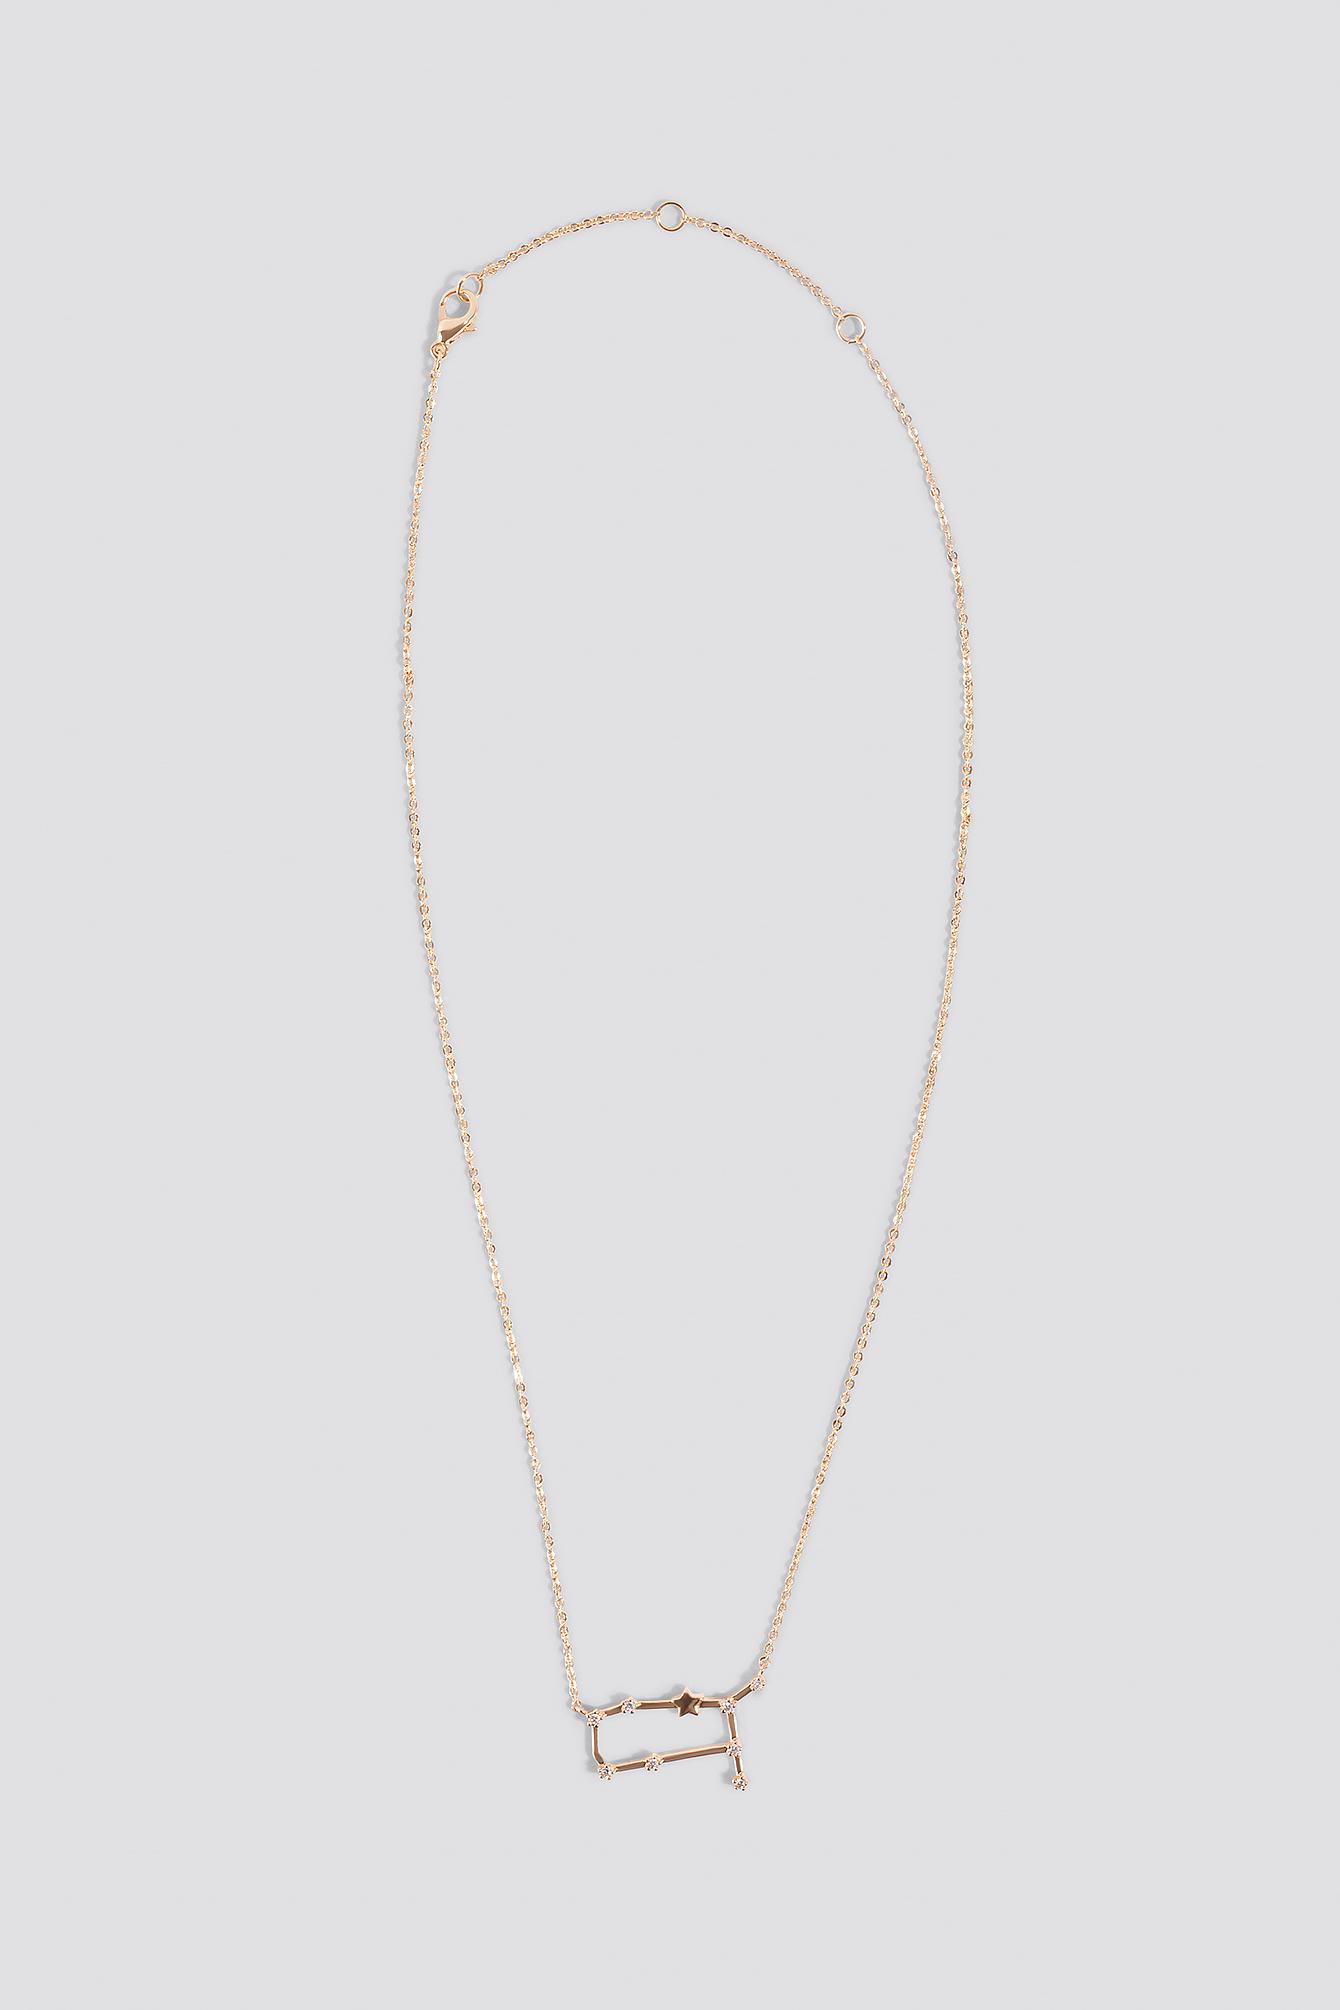 Star Sign Gemini Necklace NA-KD.COM